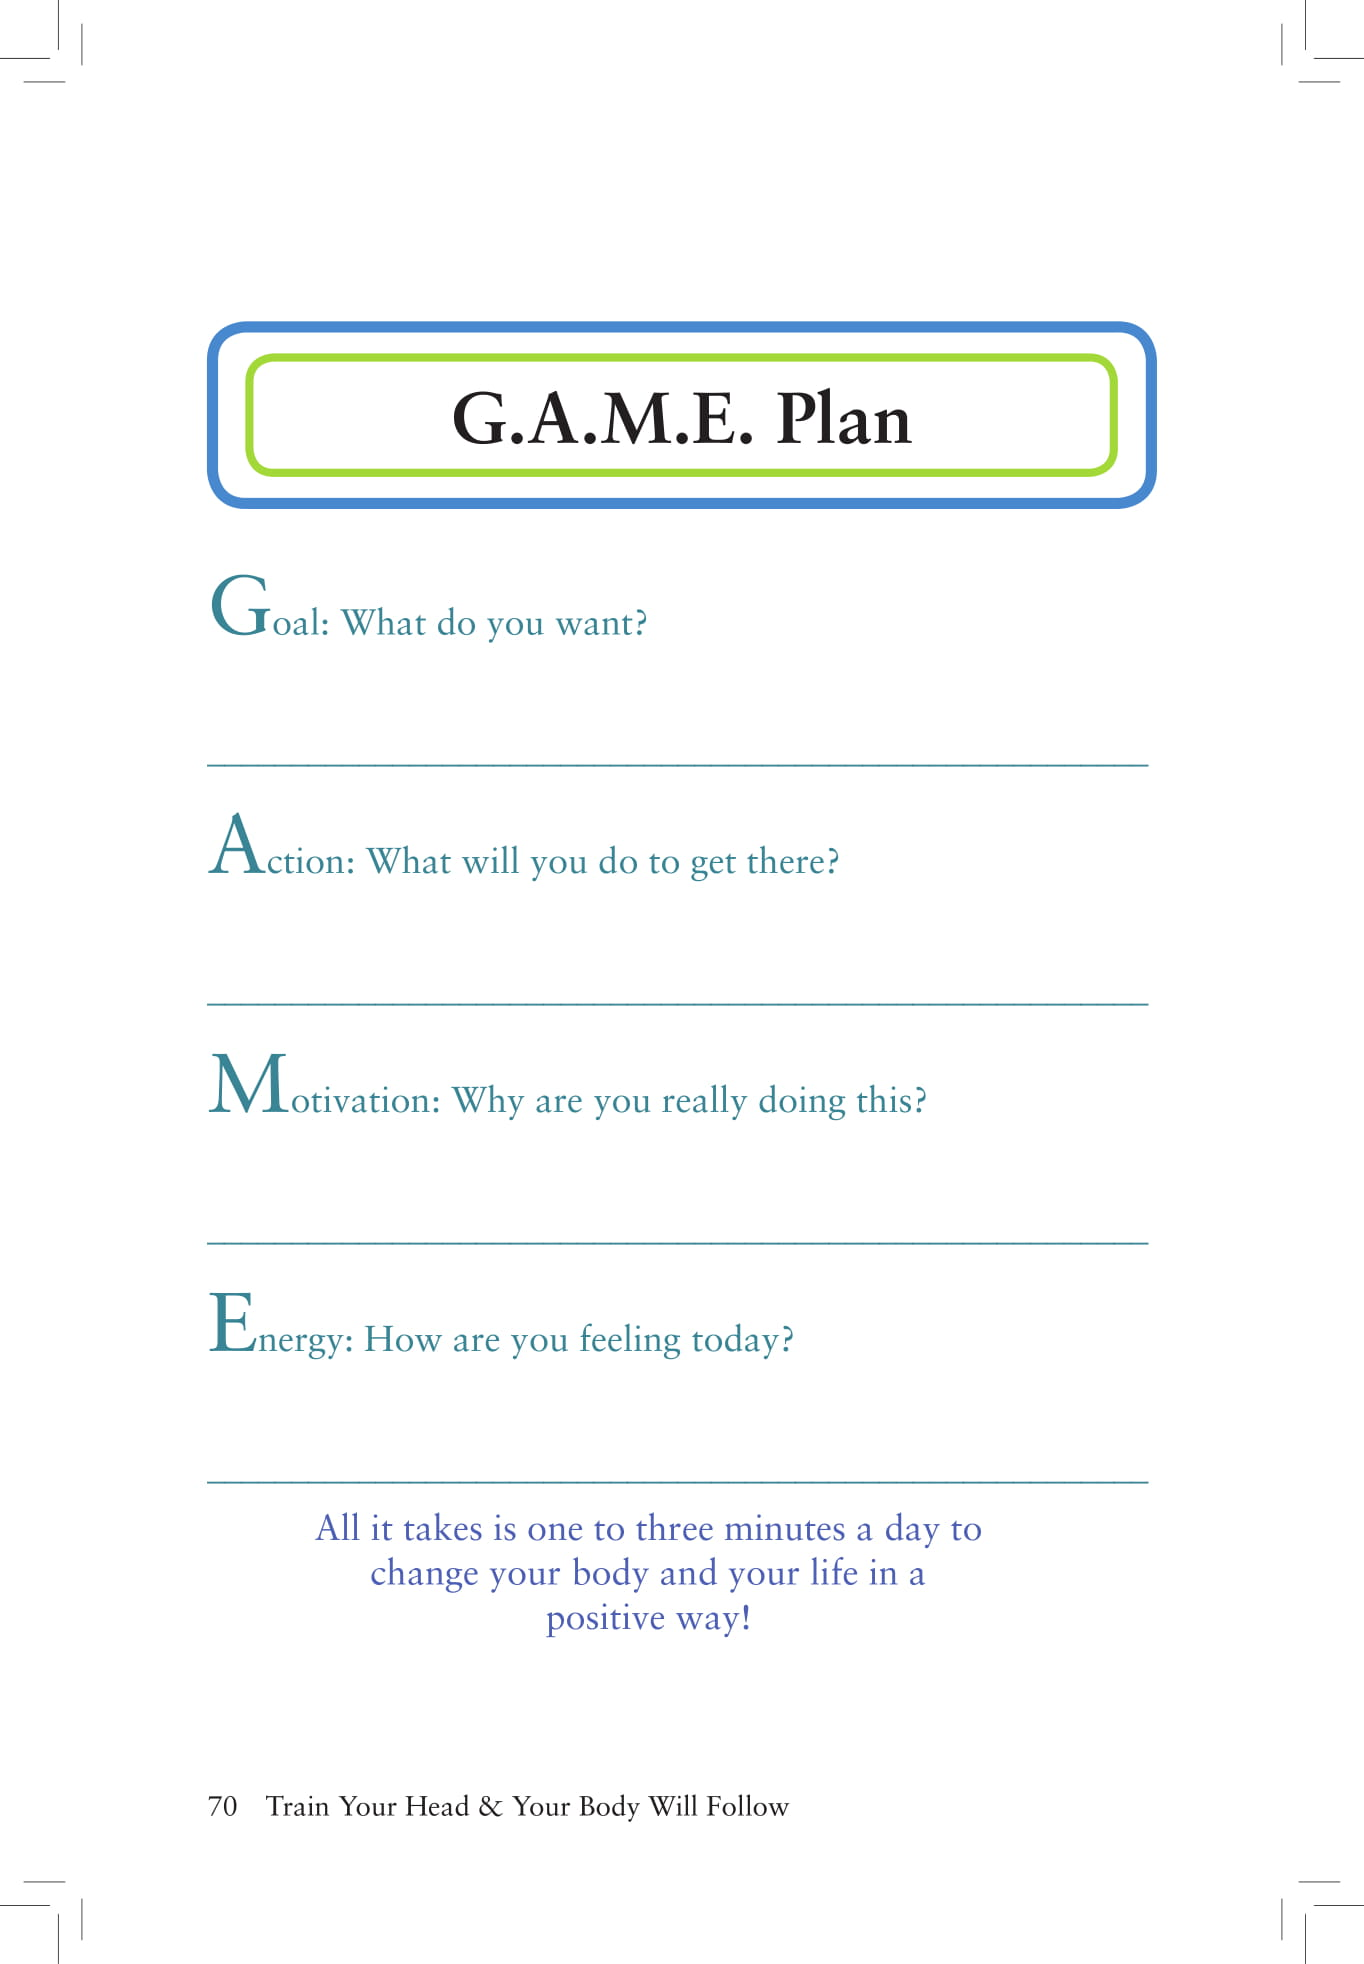 GAME Plan - THYBWF-1.jpg